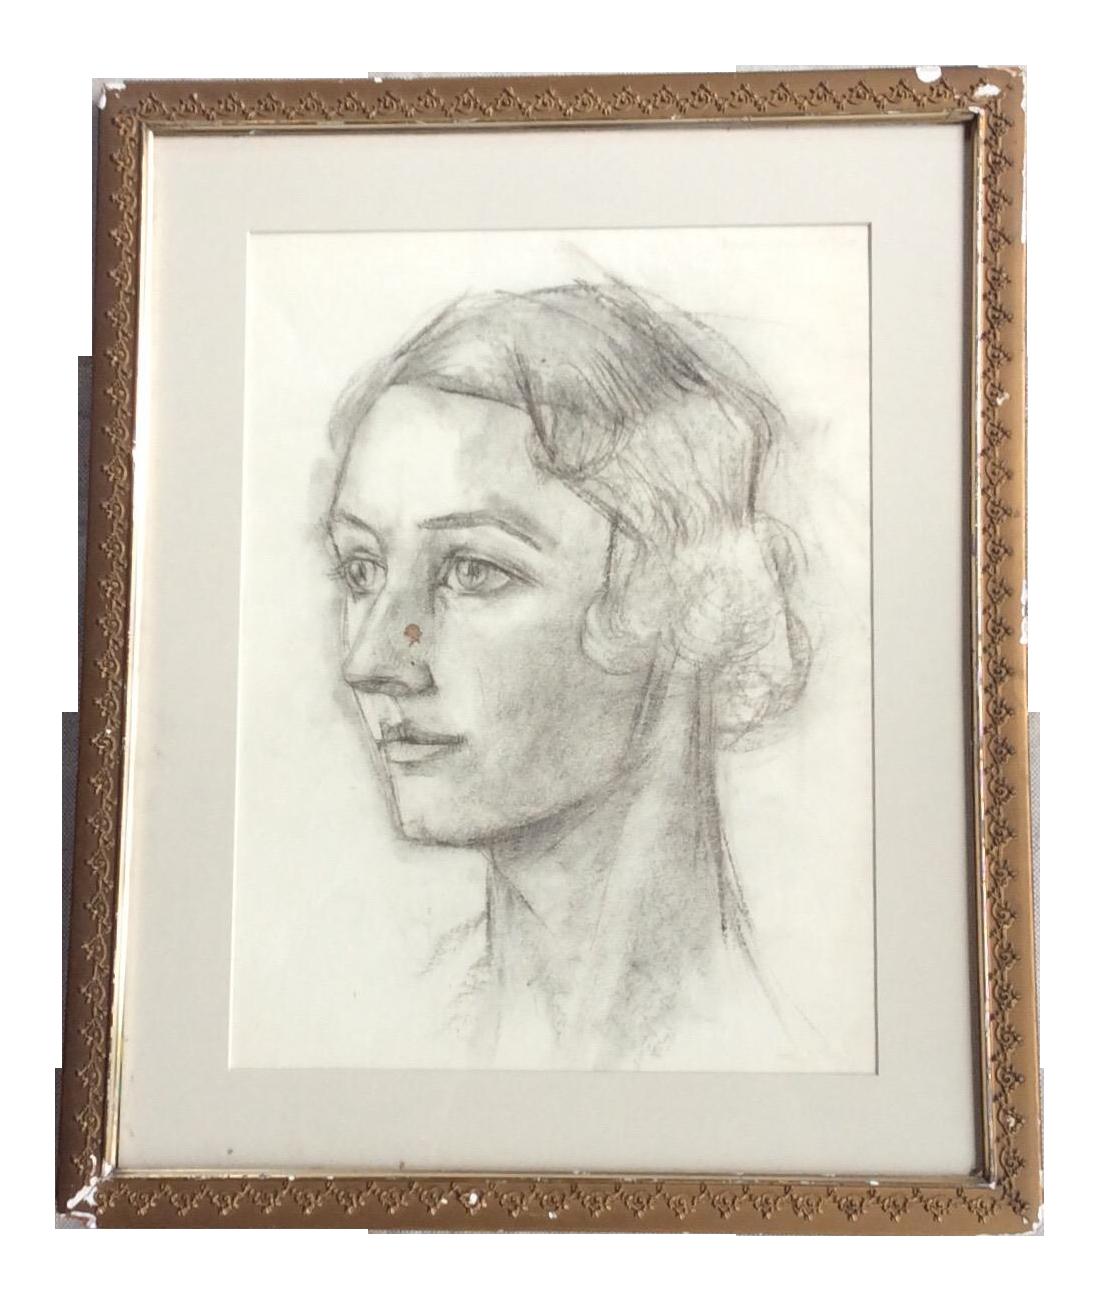 1920s Vintage Framed French Art Deco Female Portrait Sketch Chairish